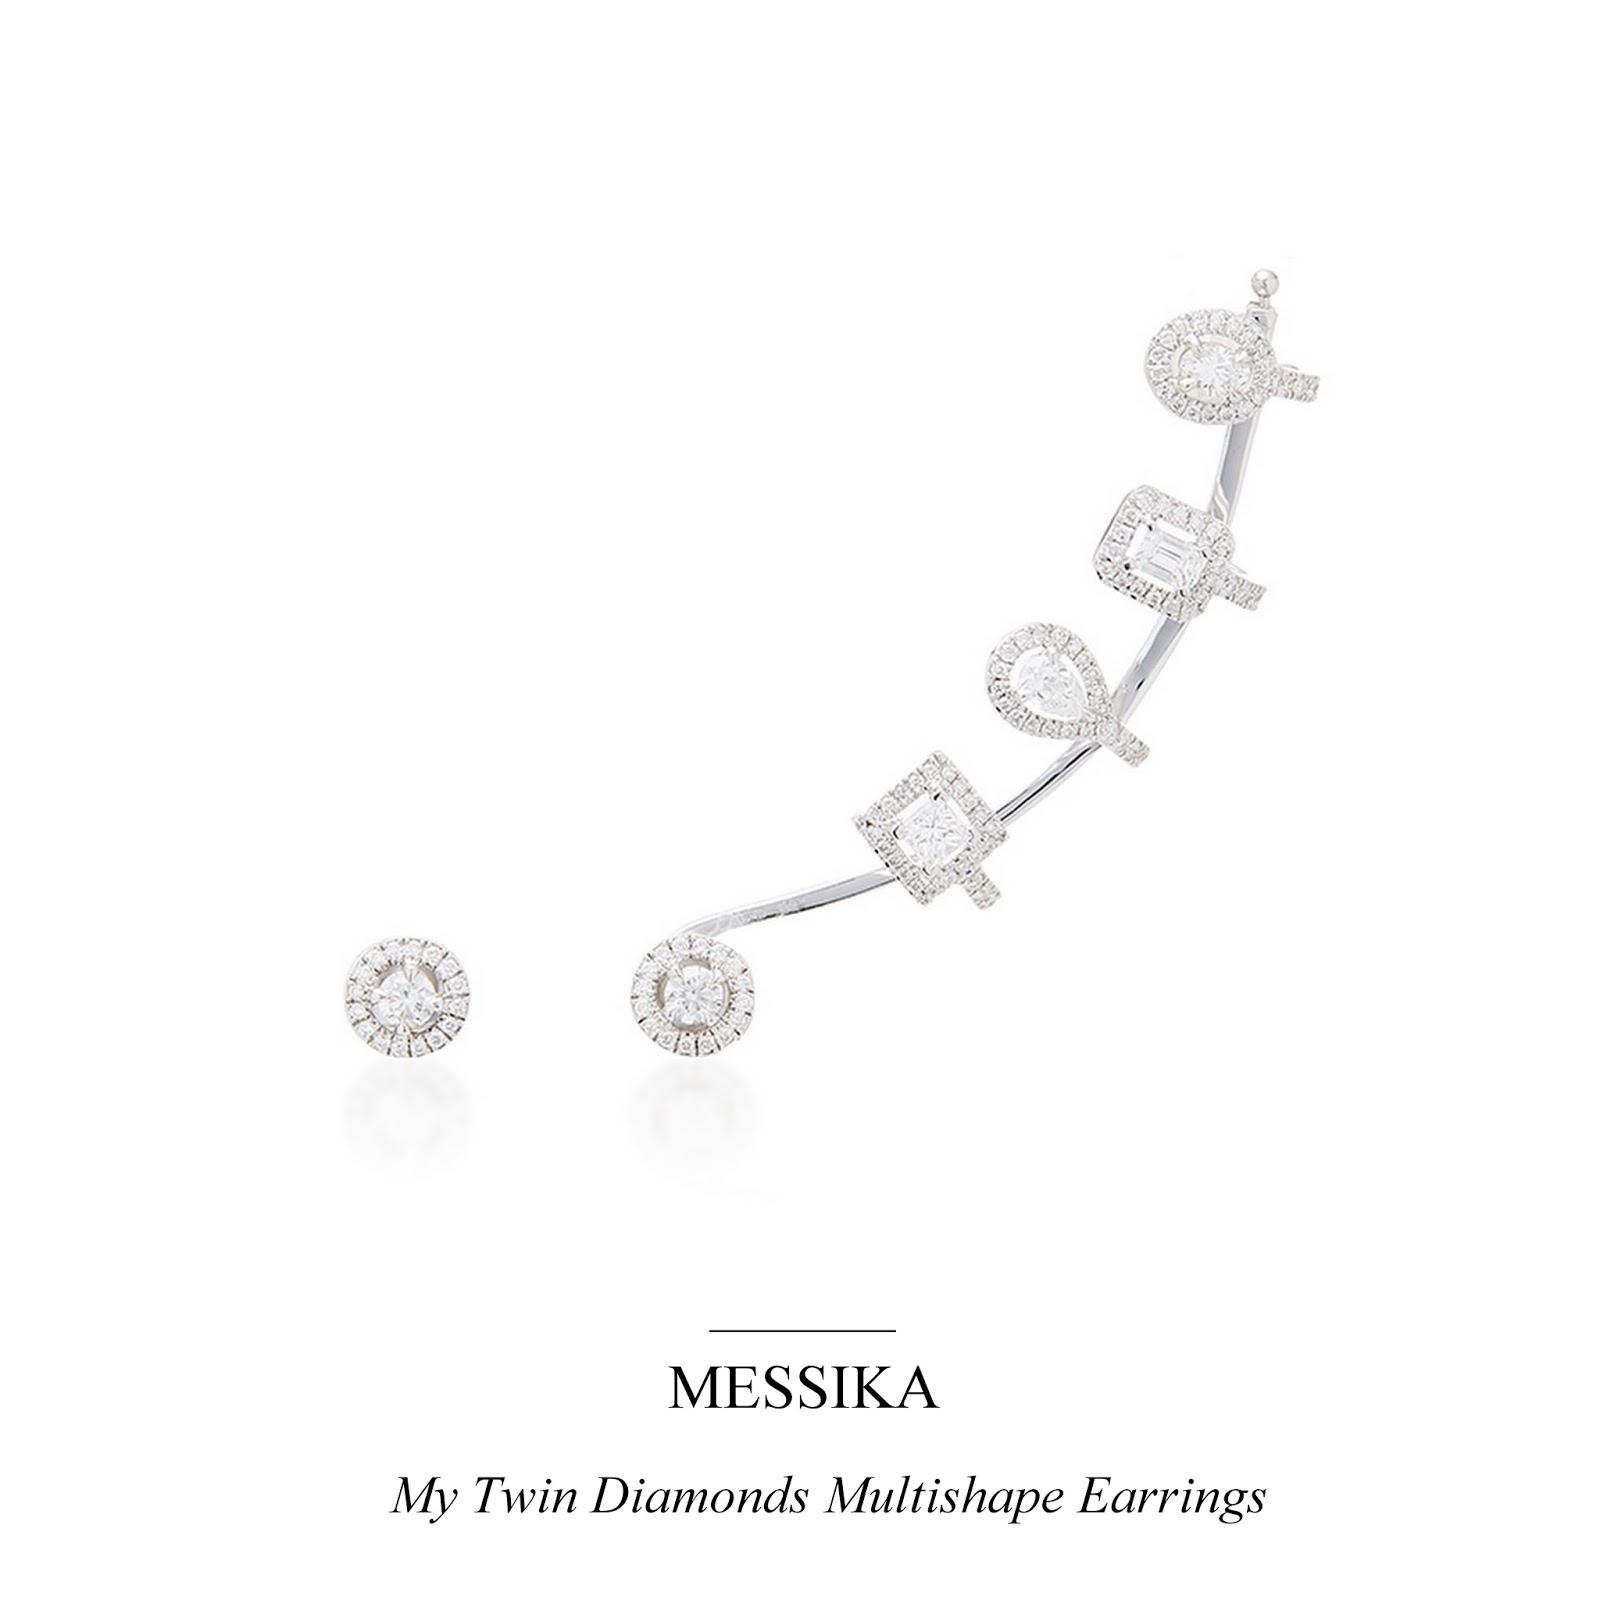 9b2a651da Day 3: My Twin Diamonds Multishape Earrings from Messika